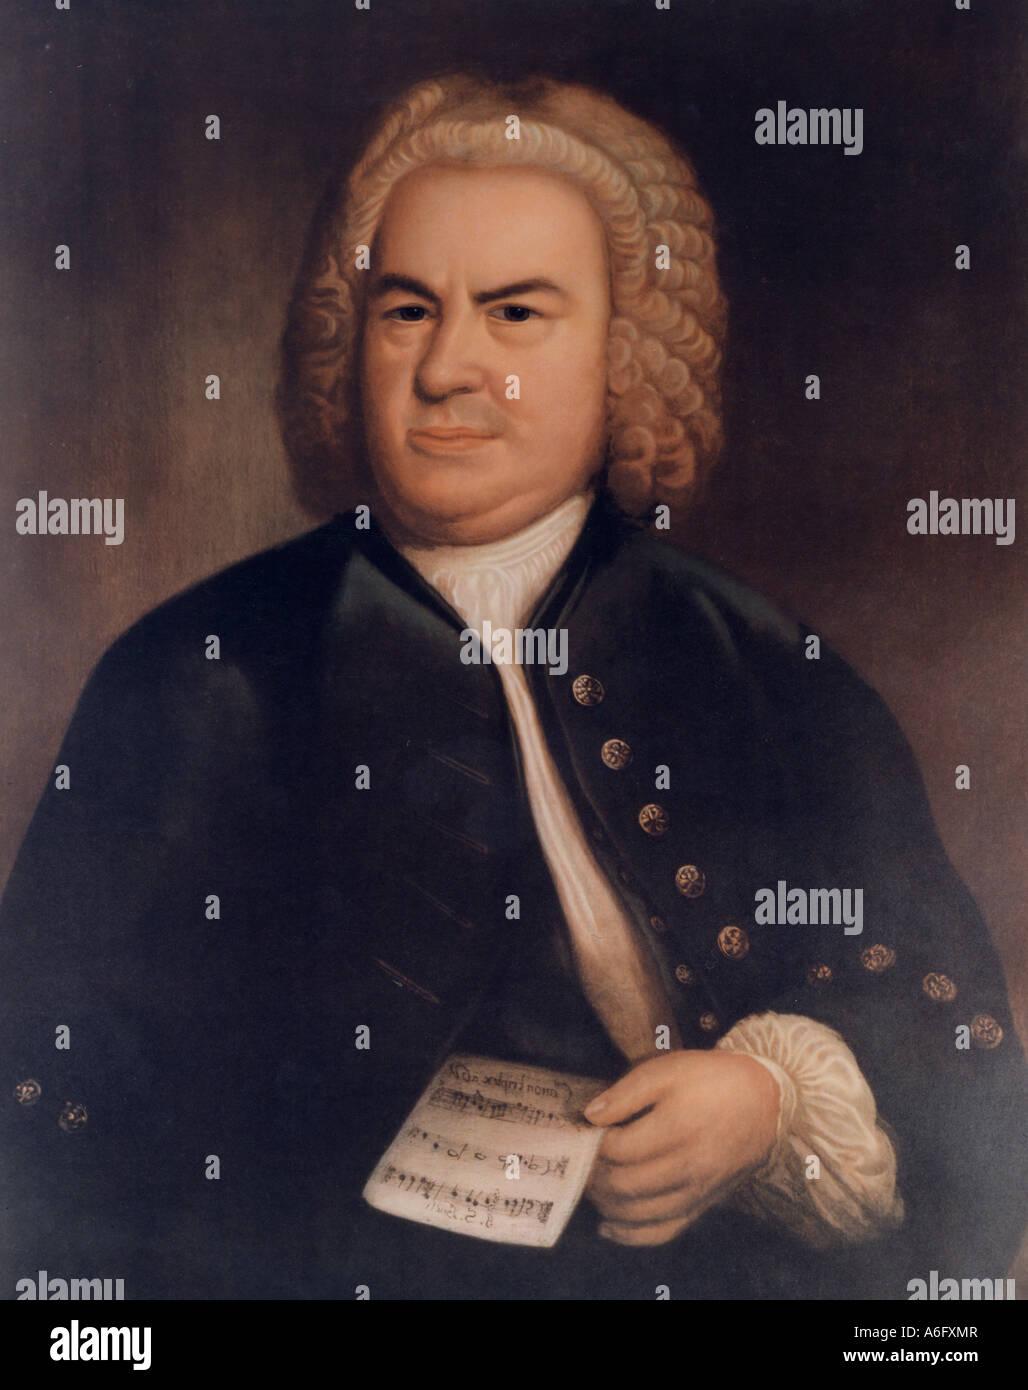 JOHANN SEBASTIAN BACH  German composer 1685 to 1750. Print of portrait by Elias Gottlieb Haussmann  in1746 - Stock Image